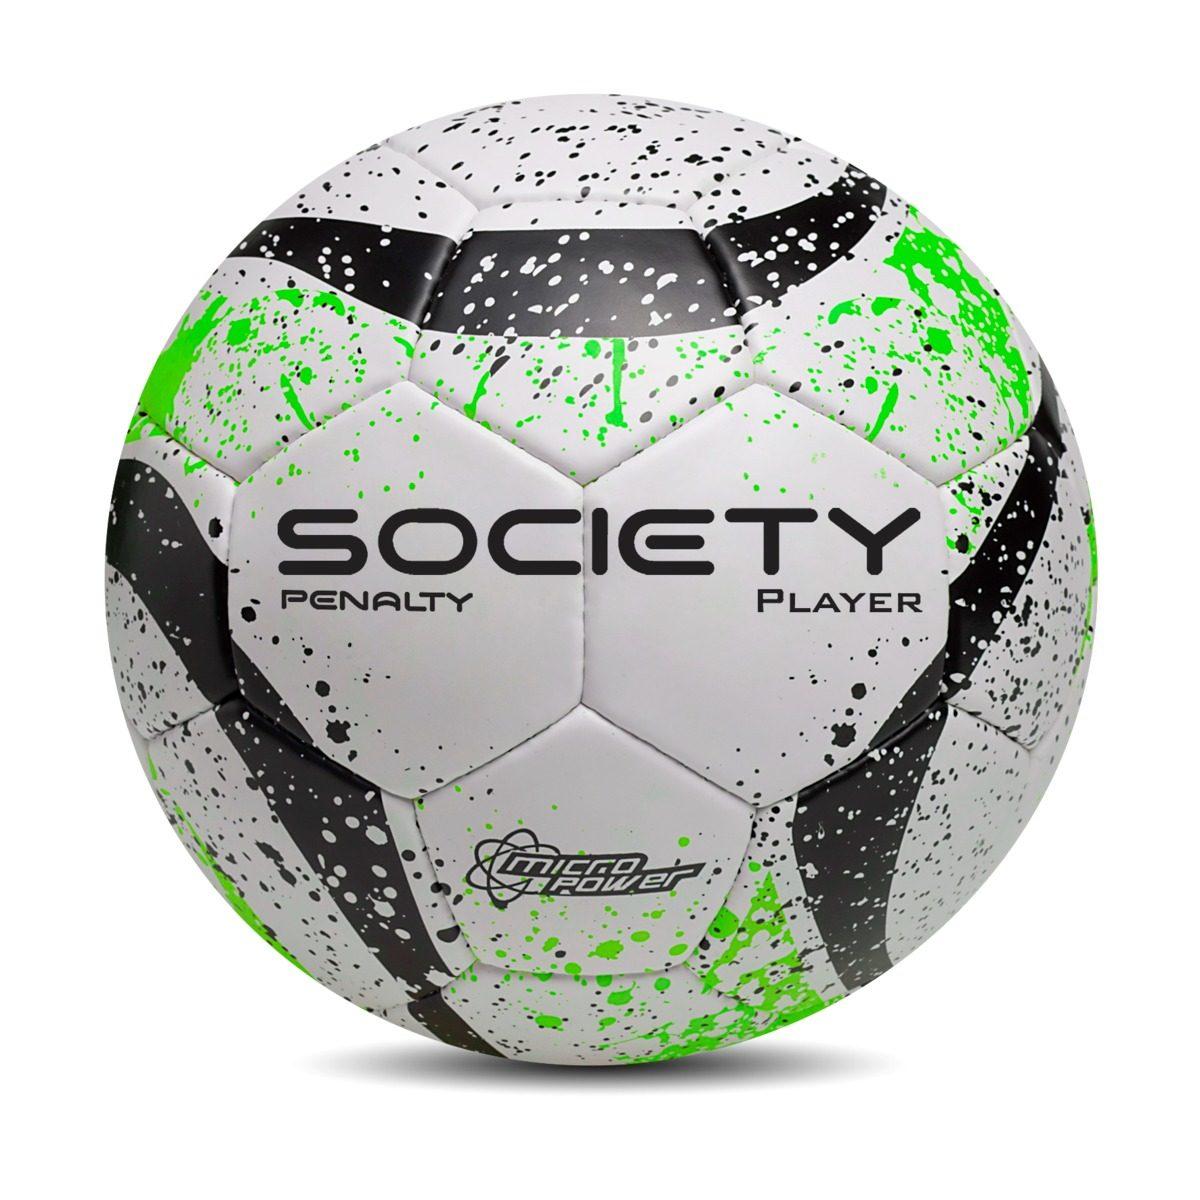 e36b44e247 Bola Futebol Society Penalty Player 2 Micro Power - Original - R  84 ...